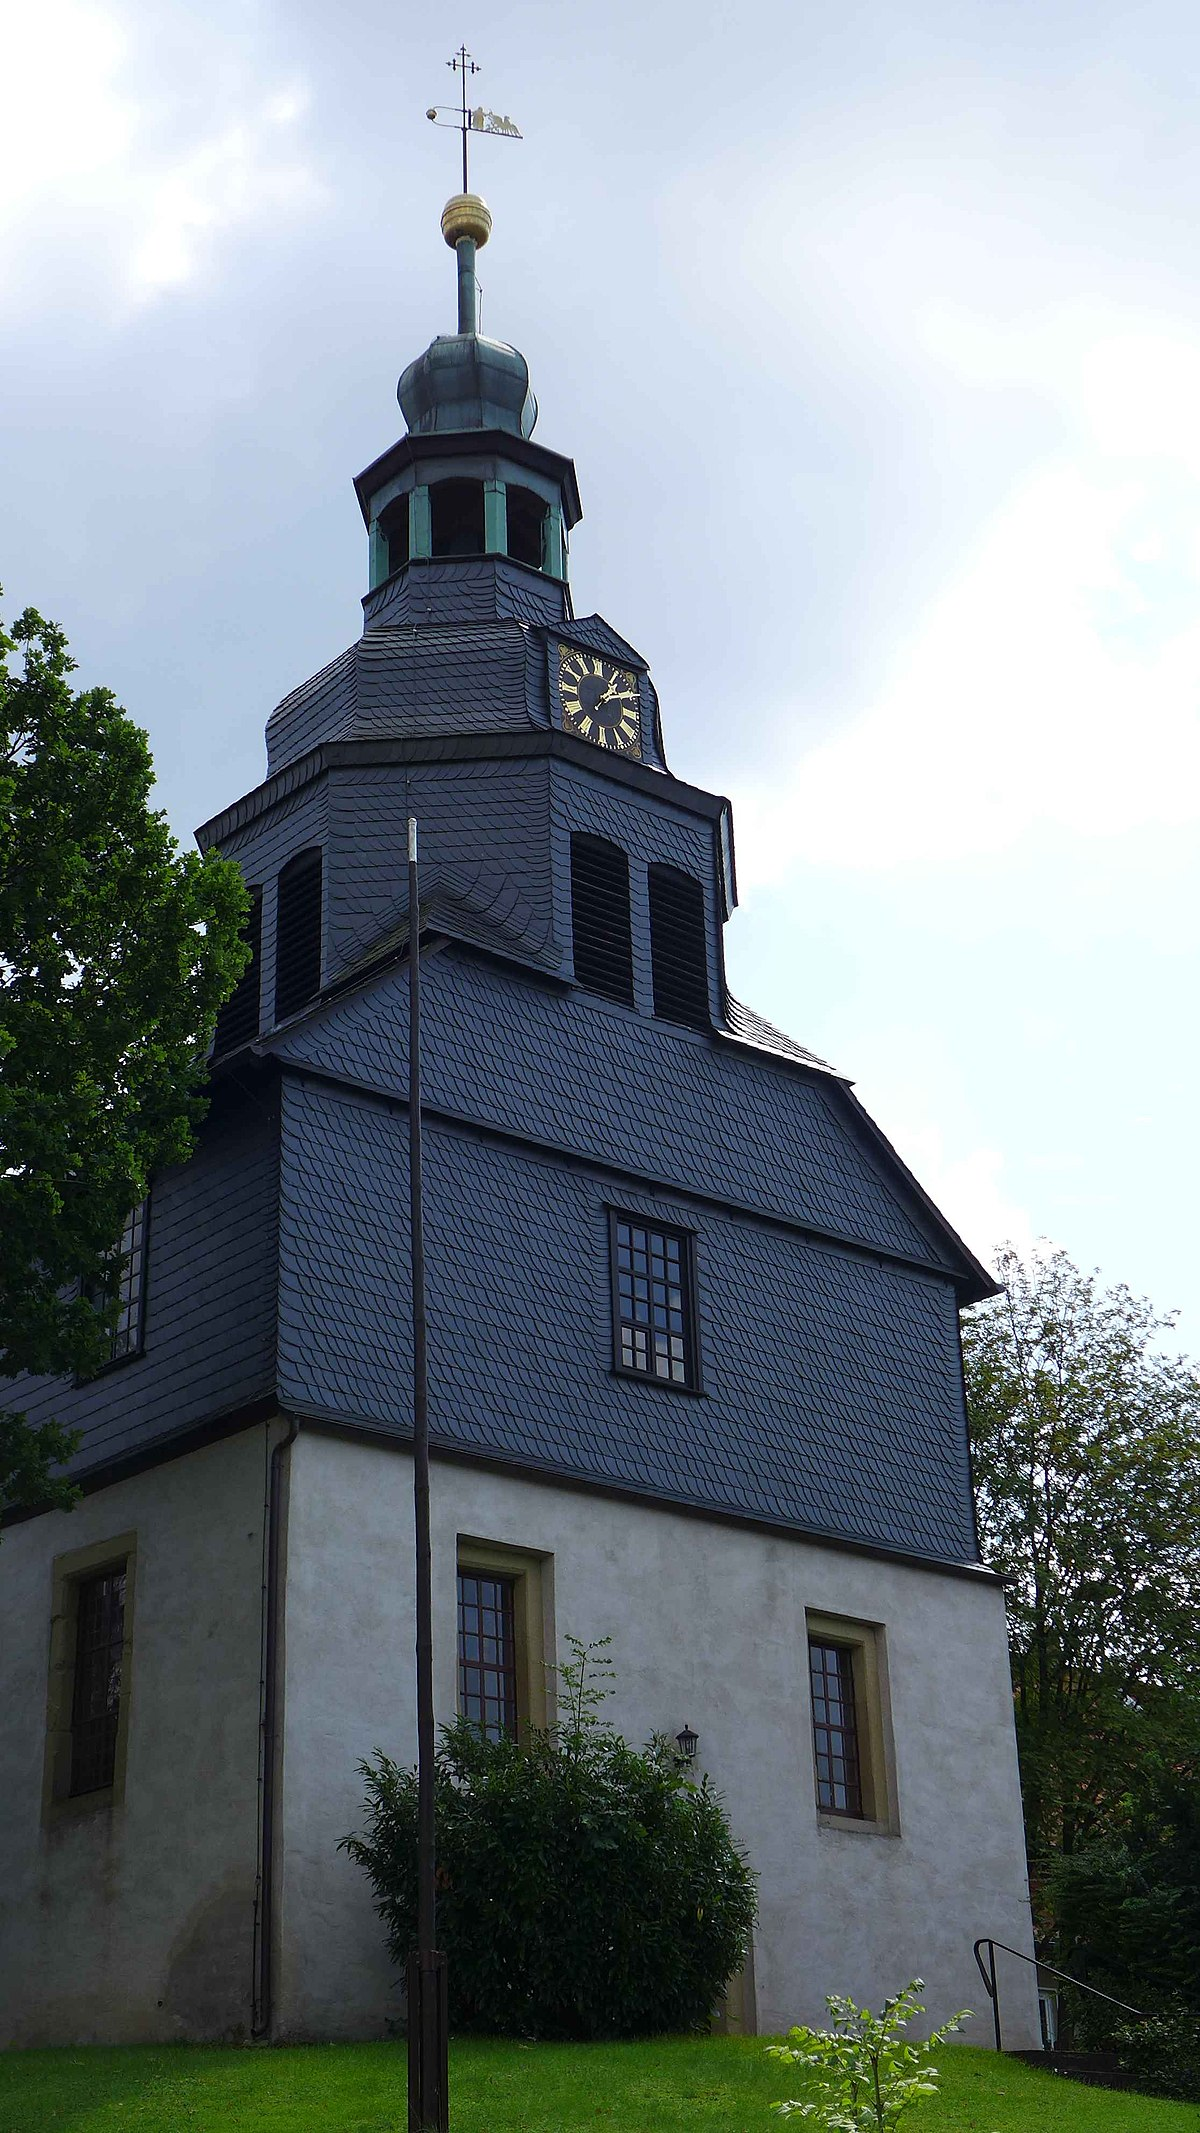 Ildehausen